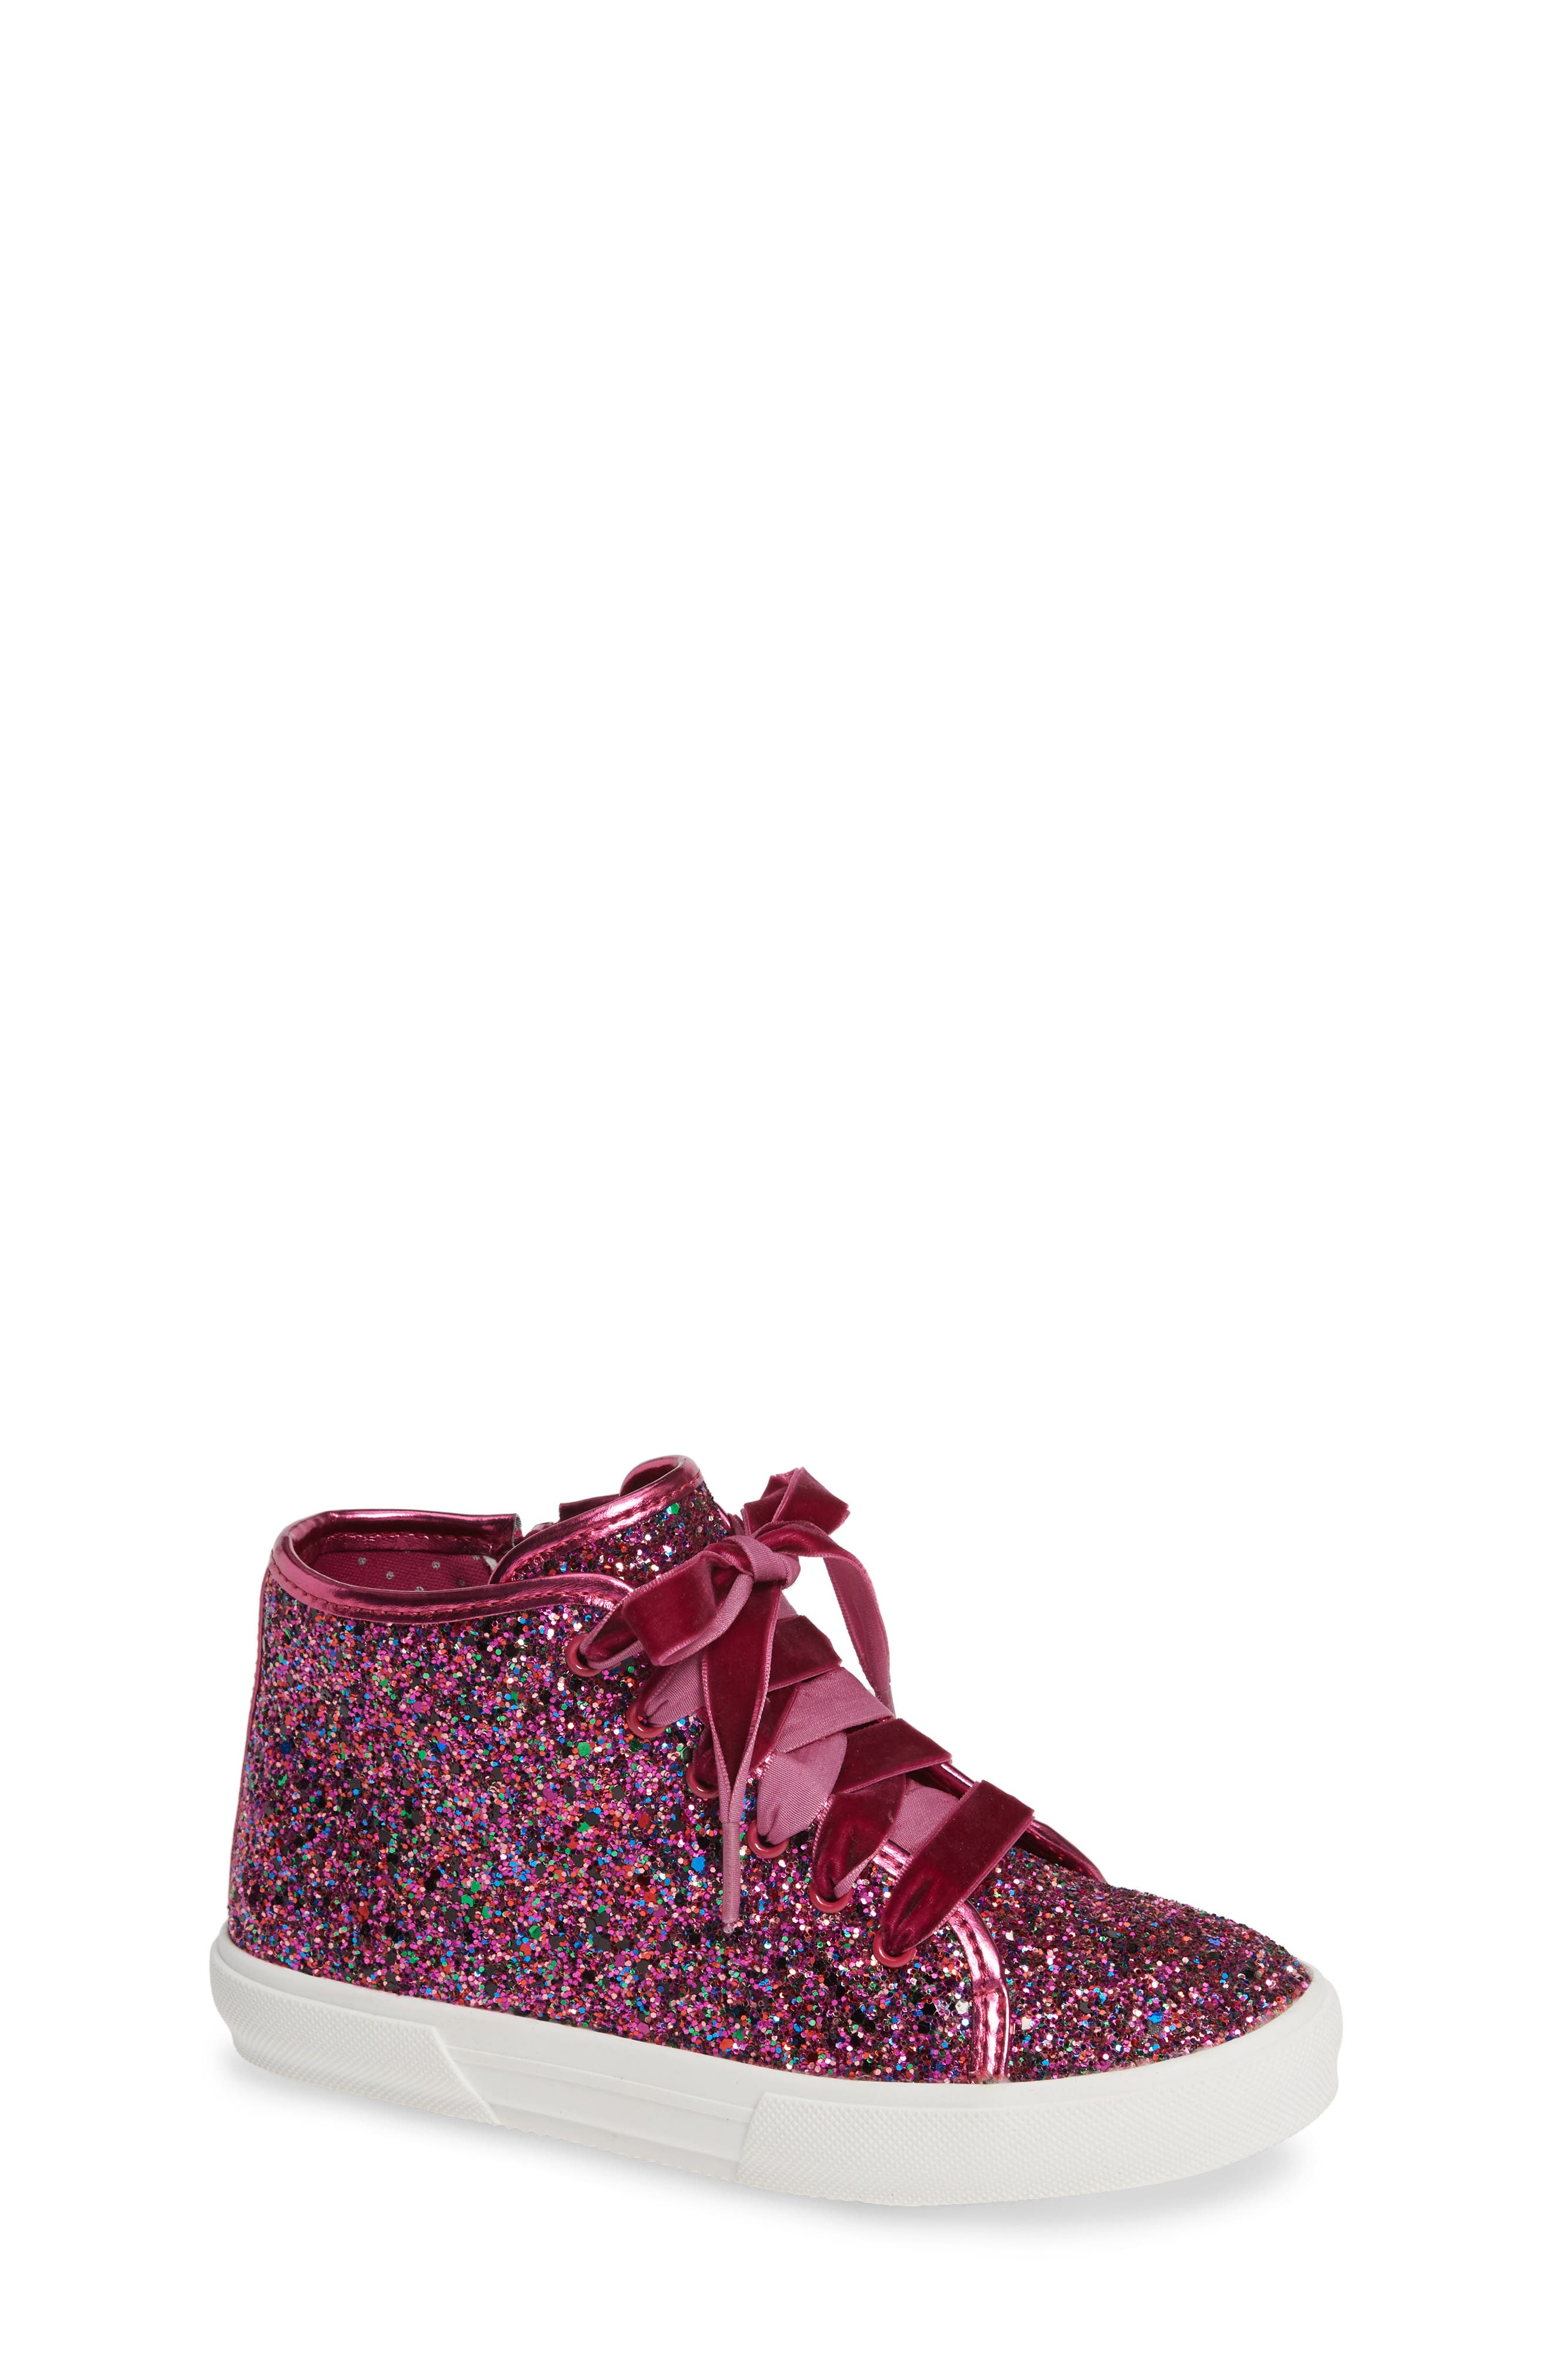 TUCKER + TATE, Skylar Glitter Sneaker, Main thumbnail 1, color, FUSCHIA MULTI GLITTER PU